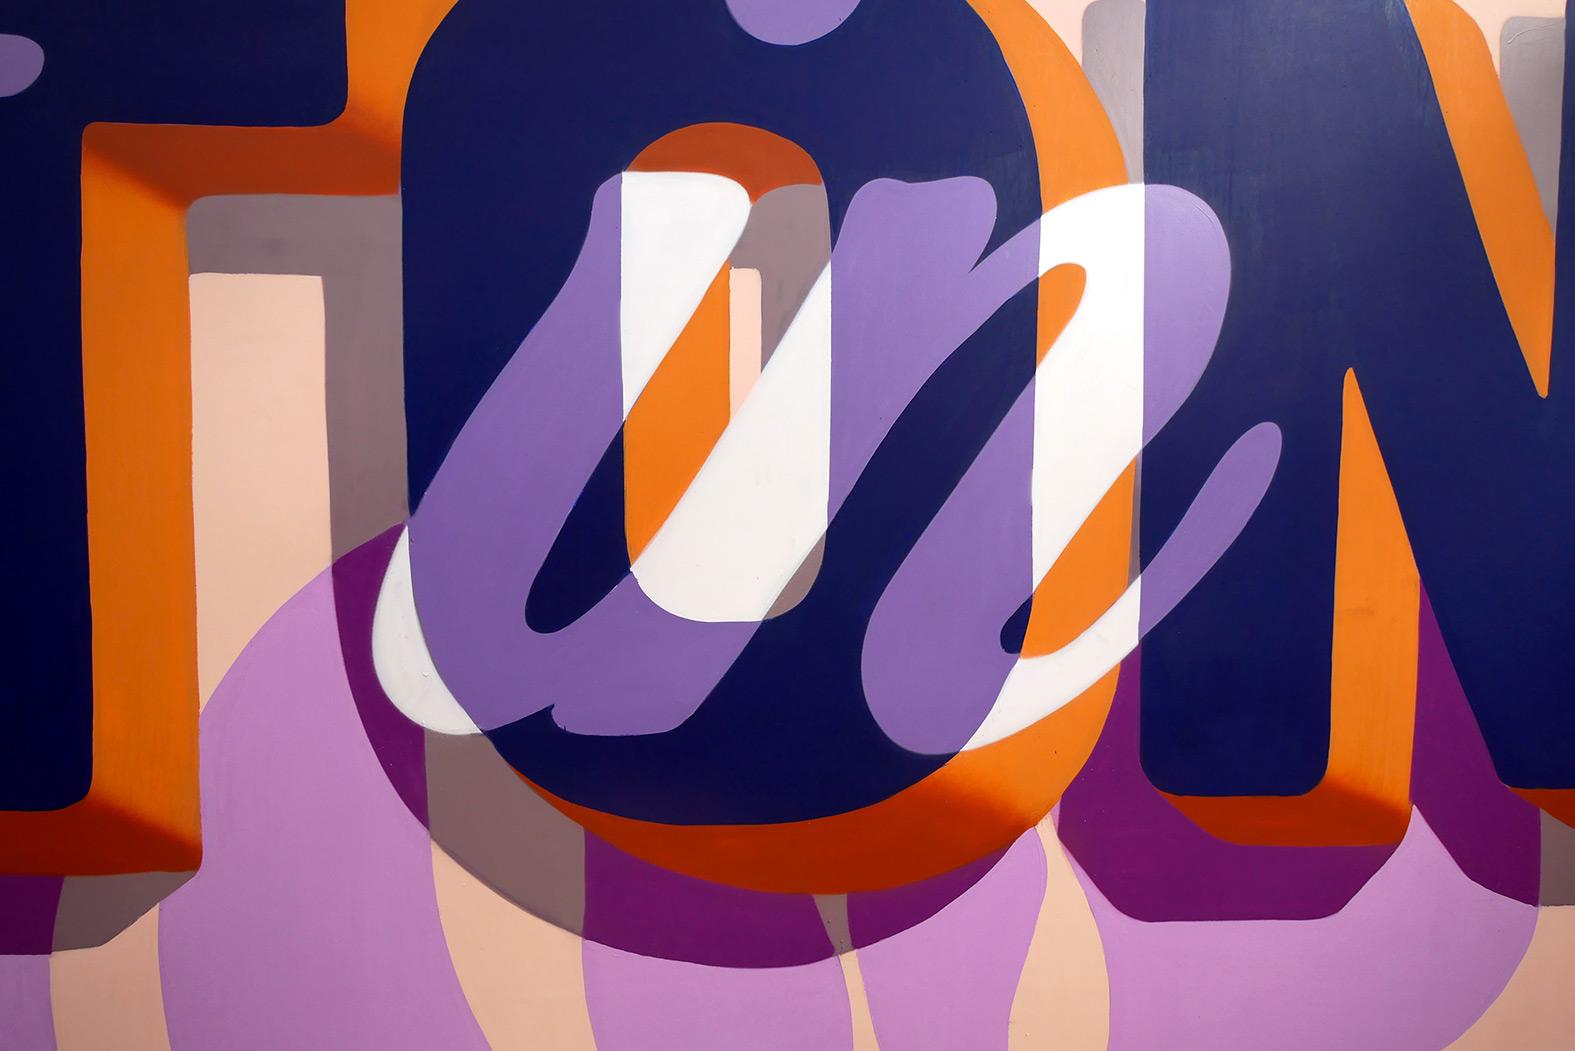 Nerone-lost-in-brixton-mural-painting-street-art-10